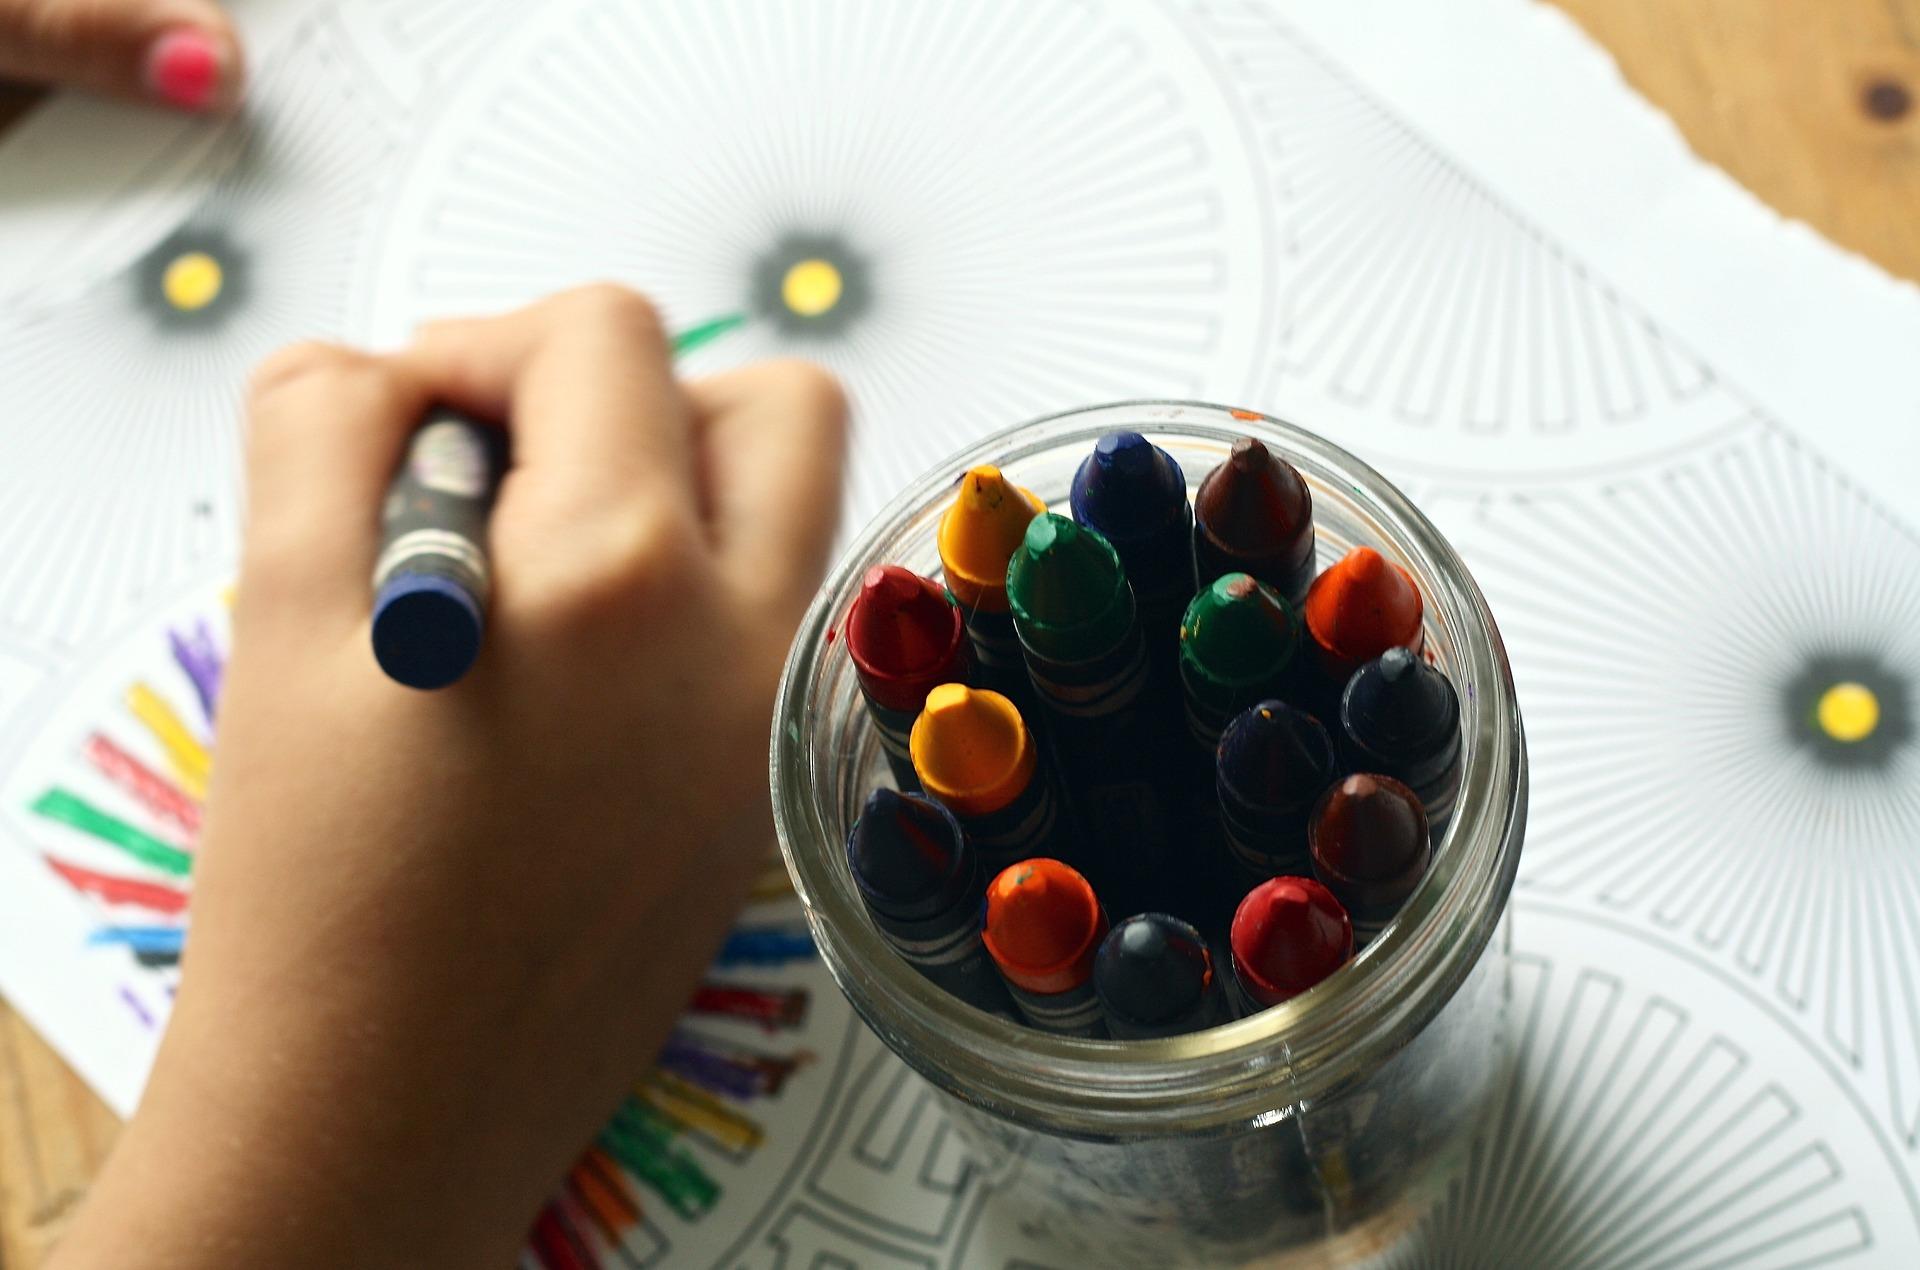 crayons-1445053_1920.jpg